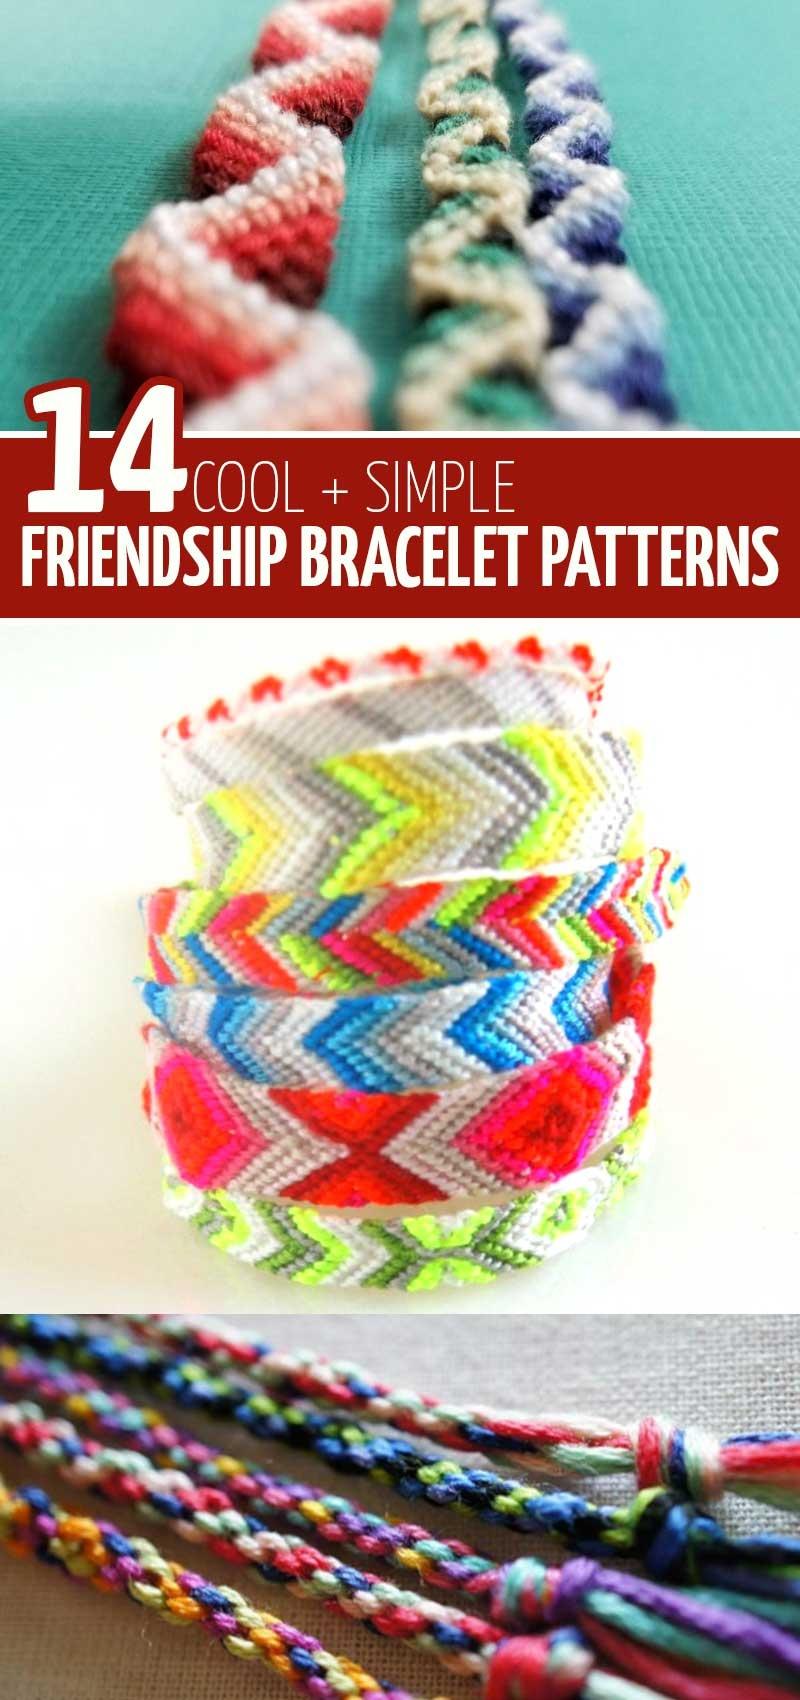 Diy Friendship Bracelet Tutorials And Patterns * Moms And Crafters - Free Printable Friendship Bracelet Patterns